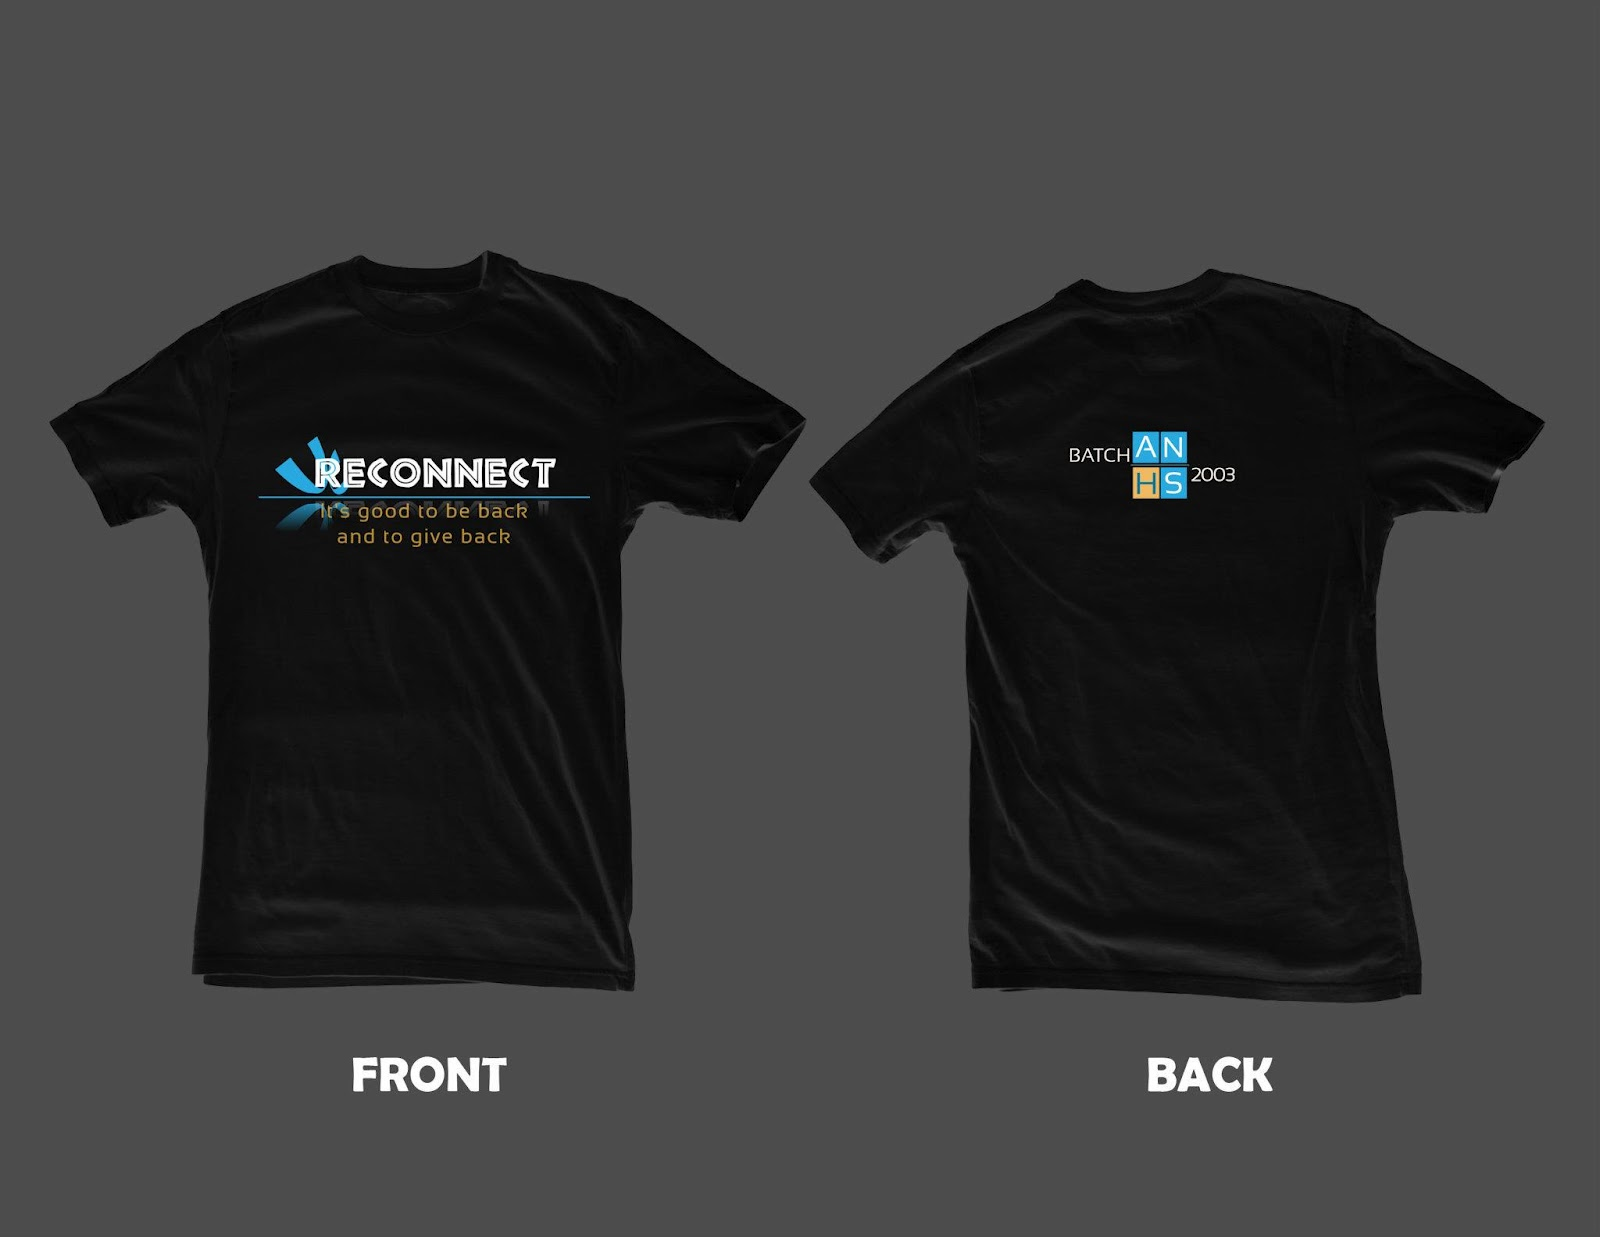 Tshirt design for alumni homecoming - The Official T Shirt Design For The Homecoming